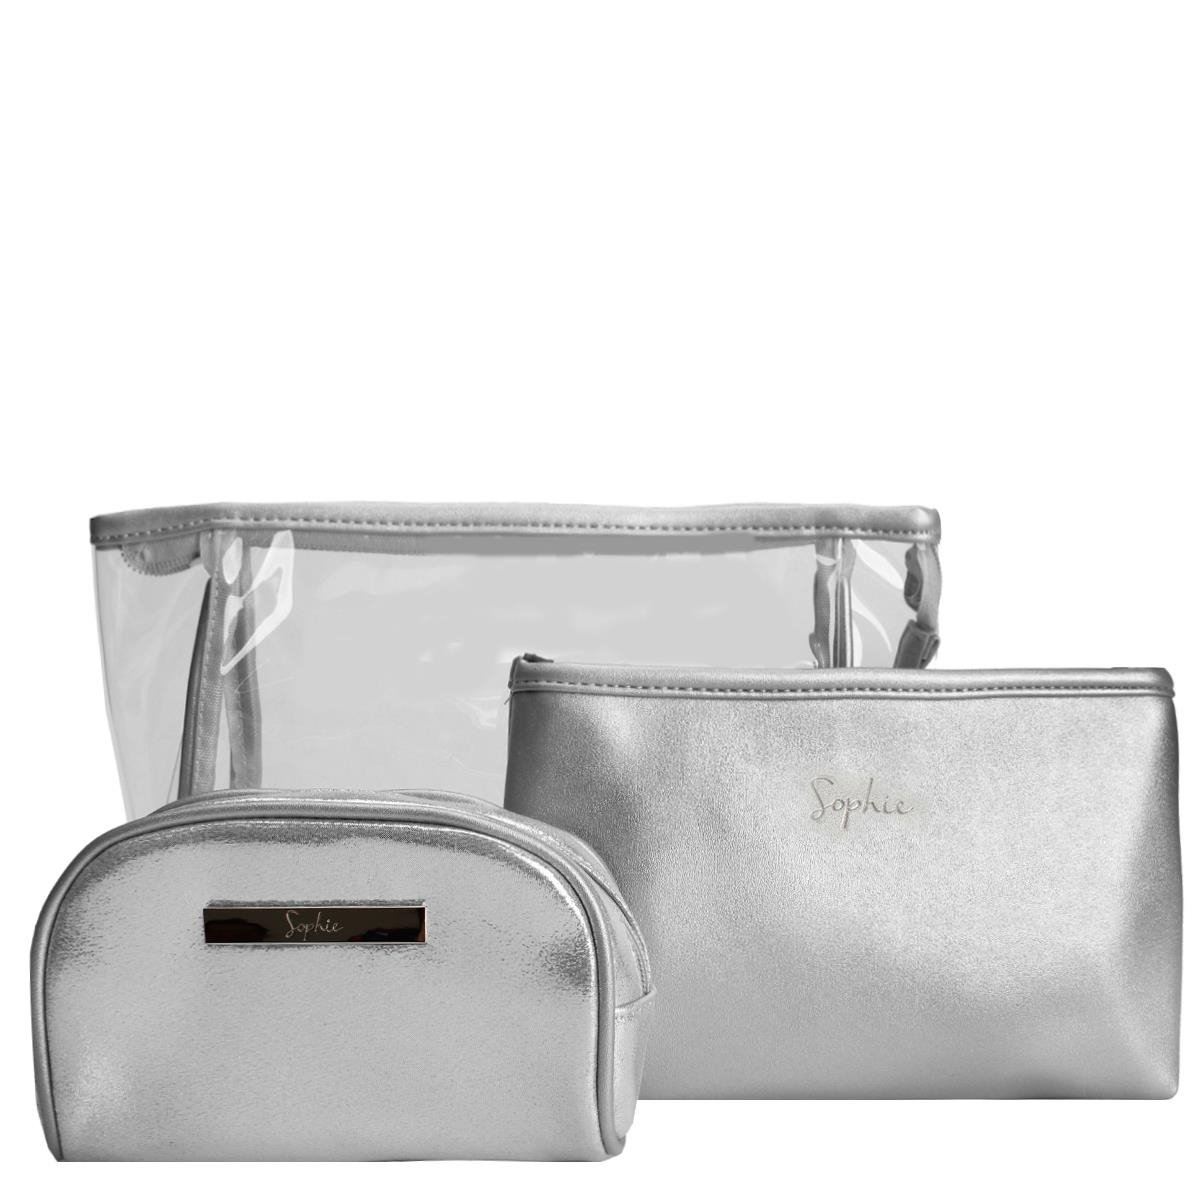 82cf51441 Kit Le Postiche Necessaire Sabrinna - Compre Agora | Netshoes